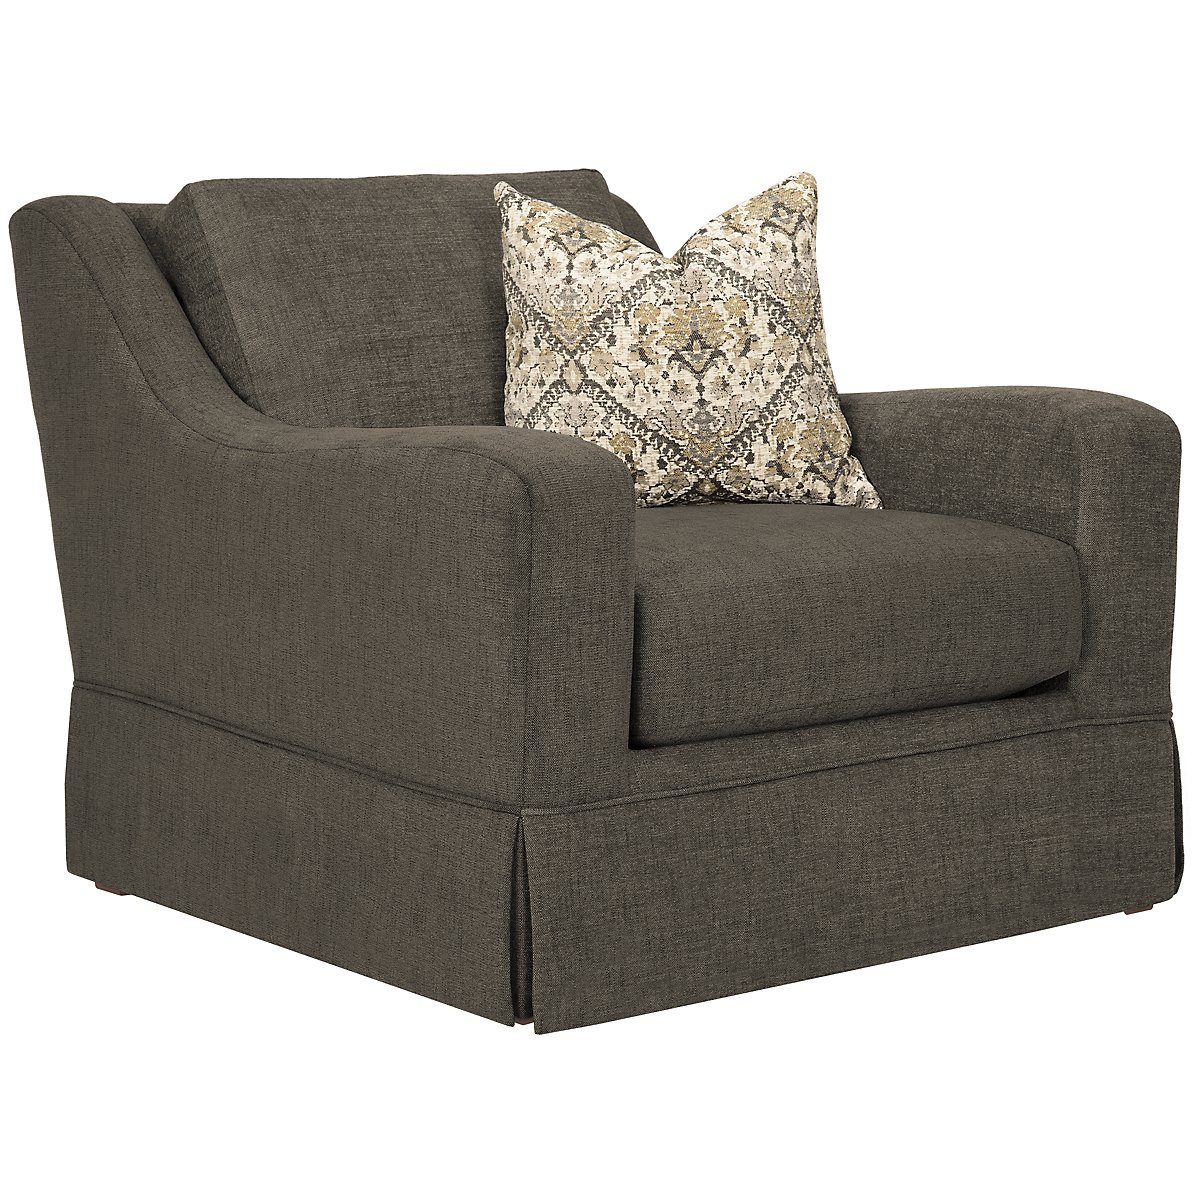 Hallie Dark Gray Fabric Chair